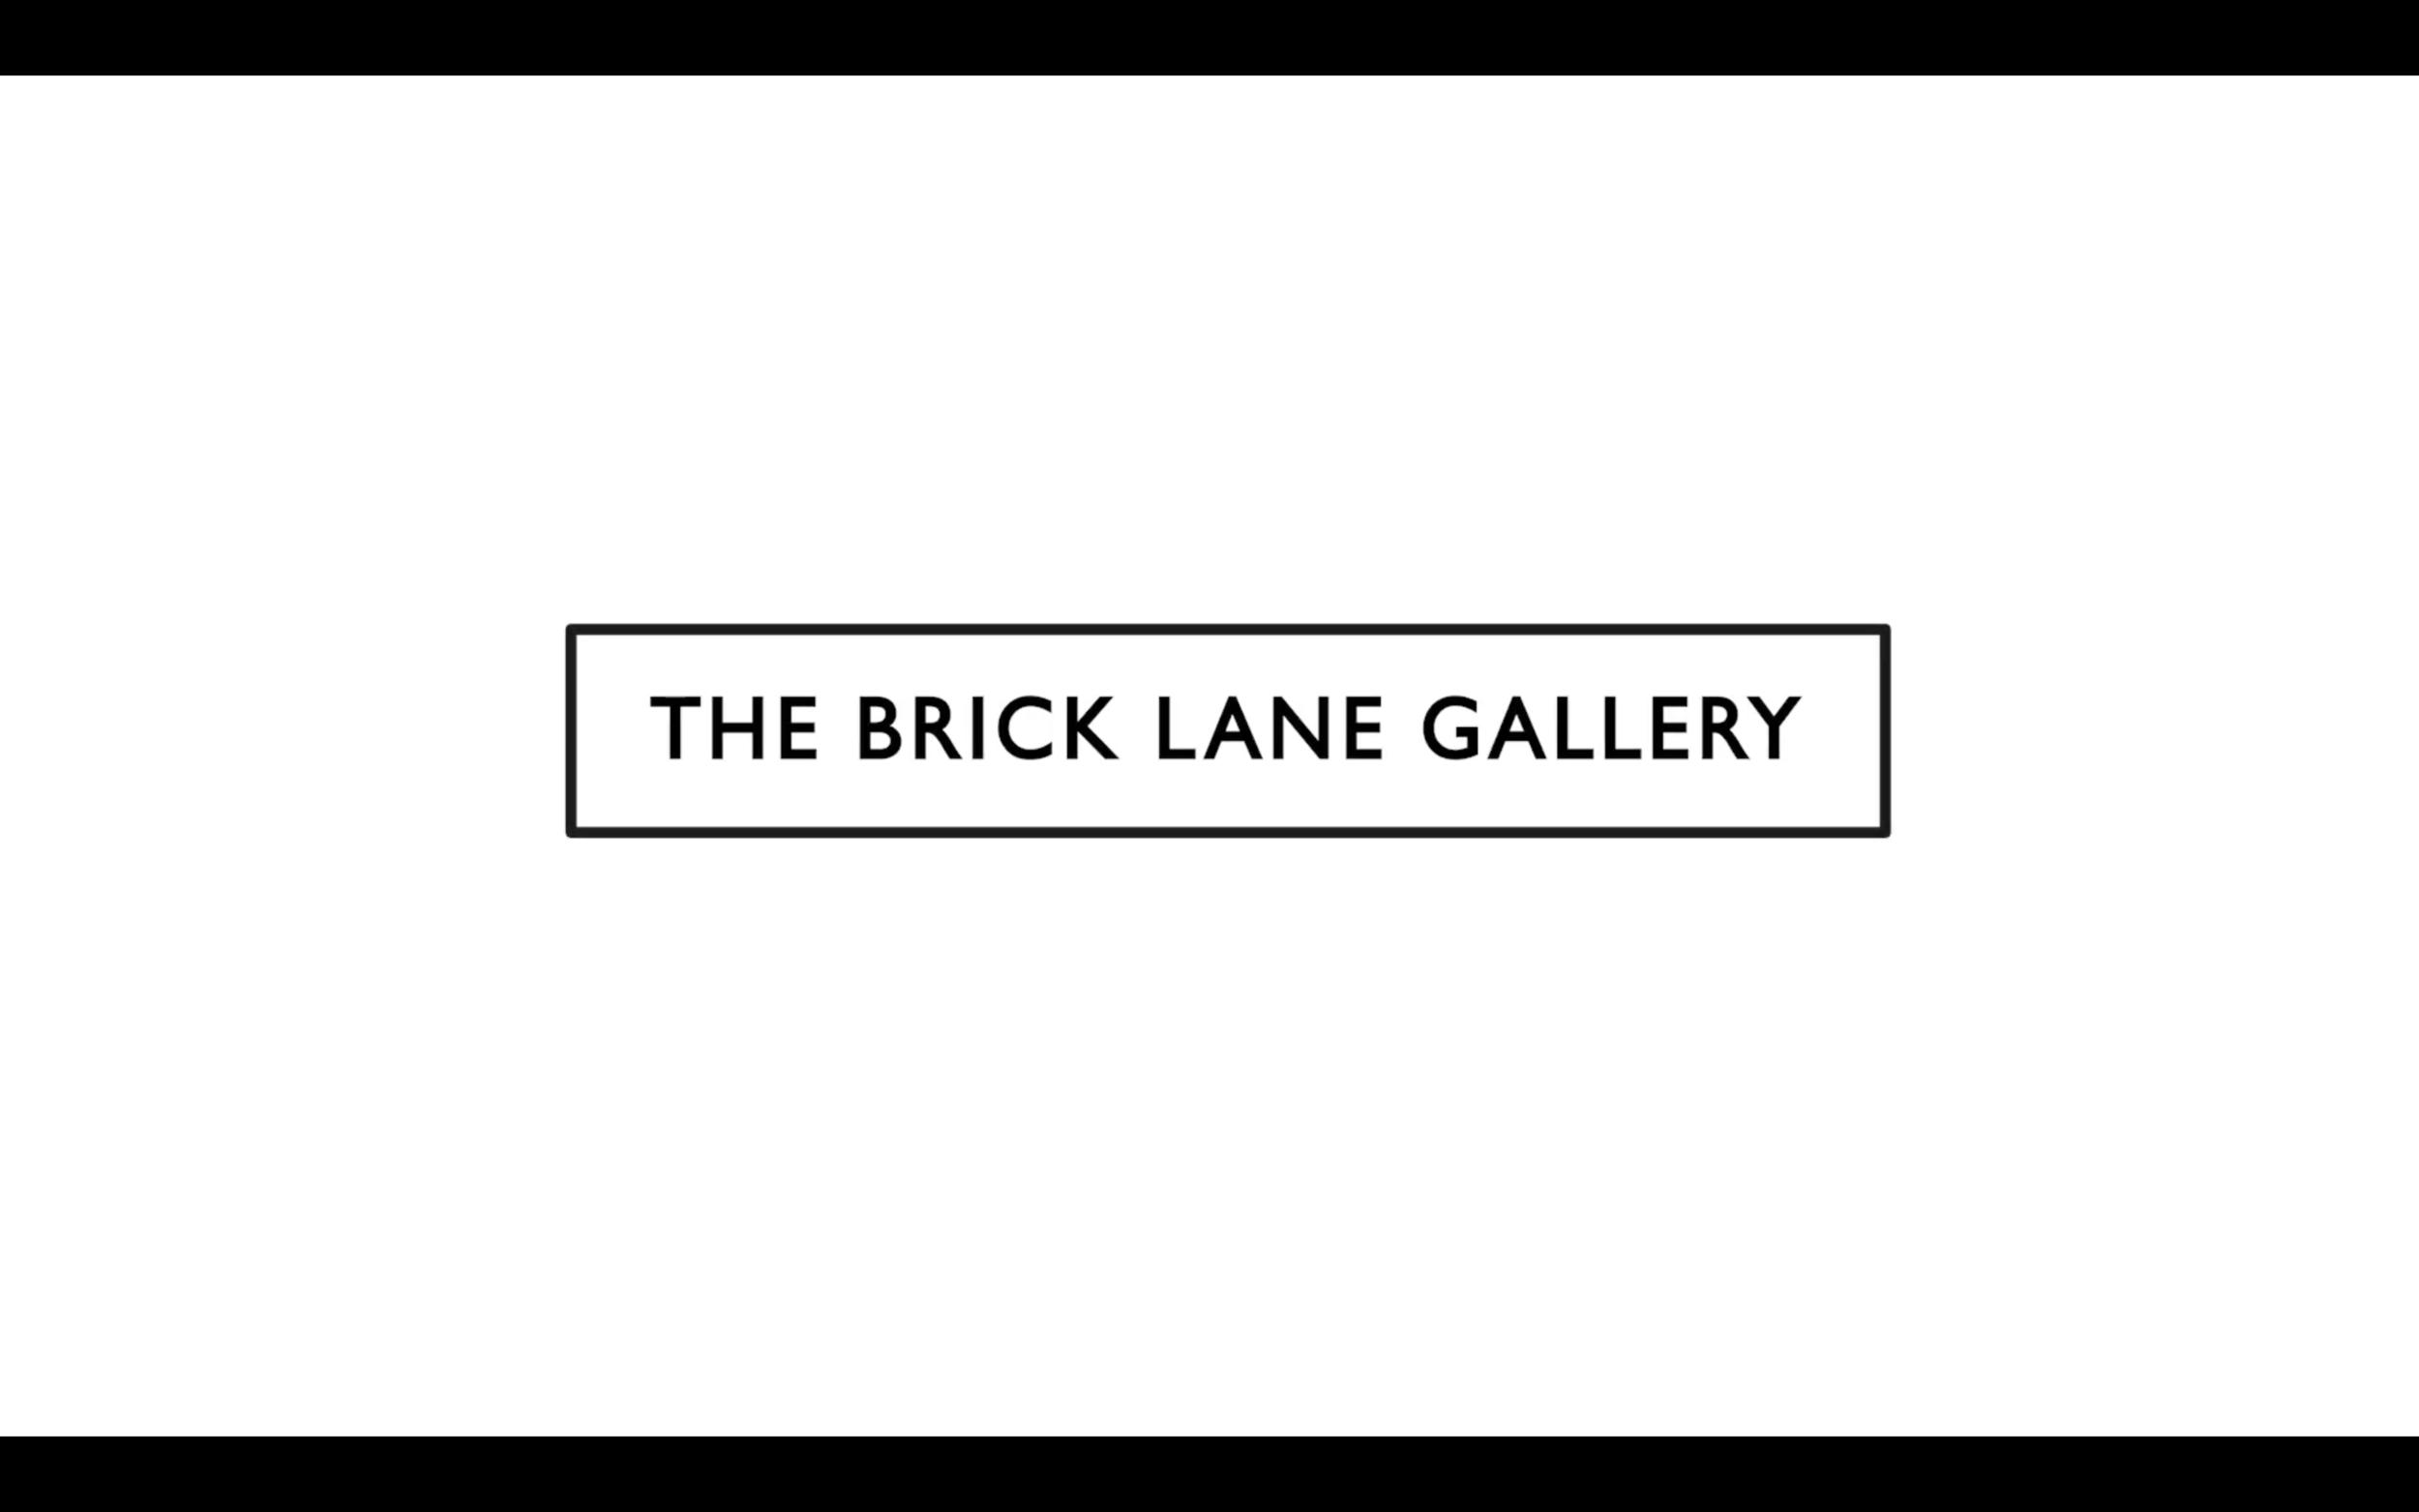 Brick Lane Gallery exhibition promo Video